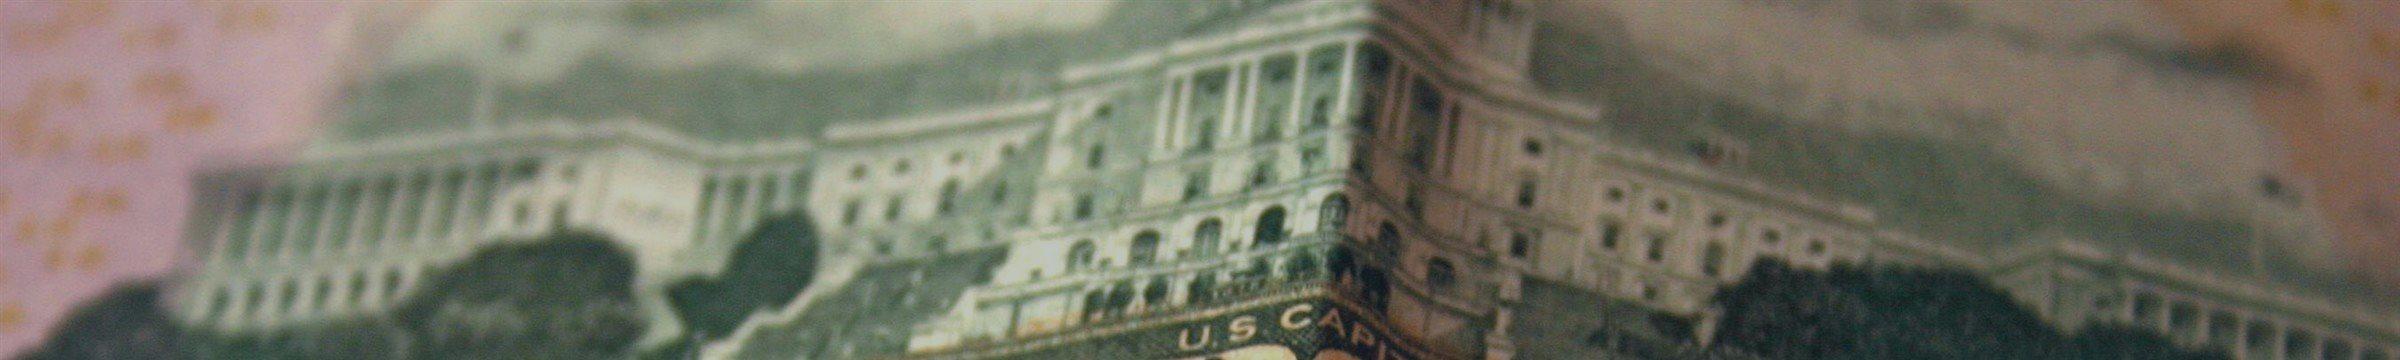 EUR/USD, Pronóstico 26 Febrero 2015, Análisis Técnico